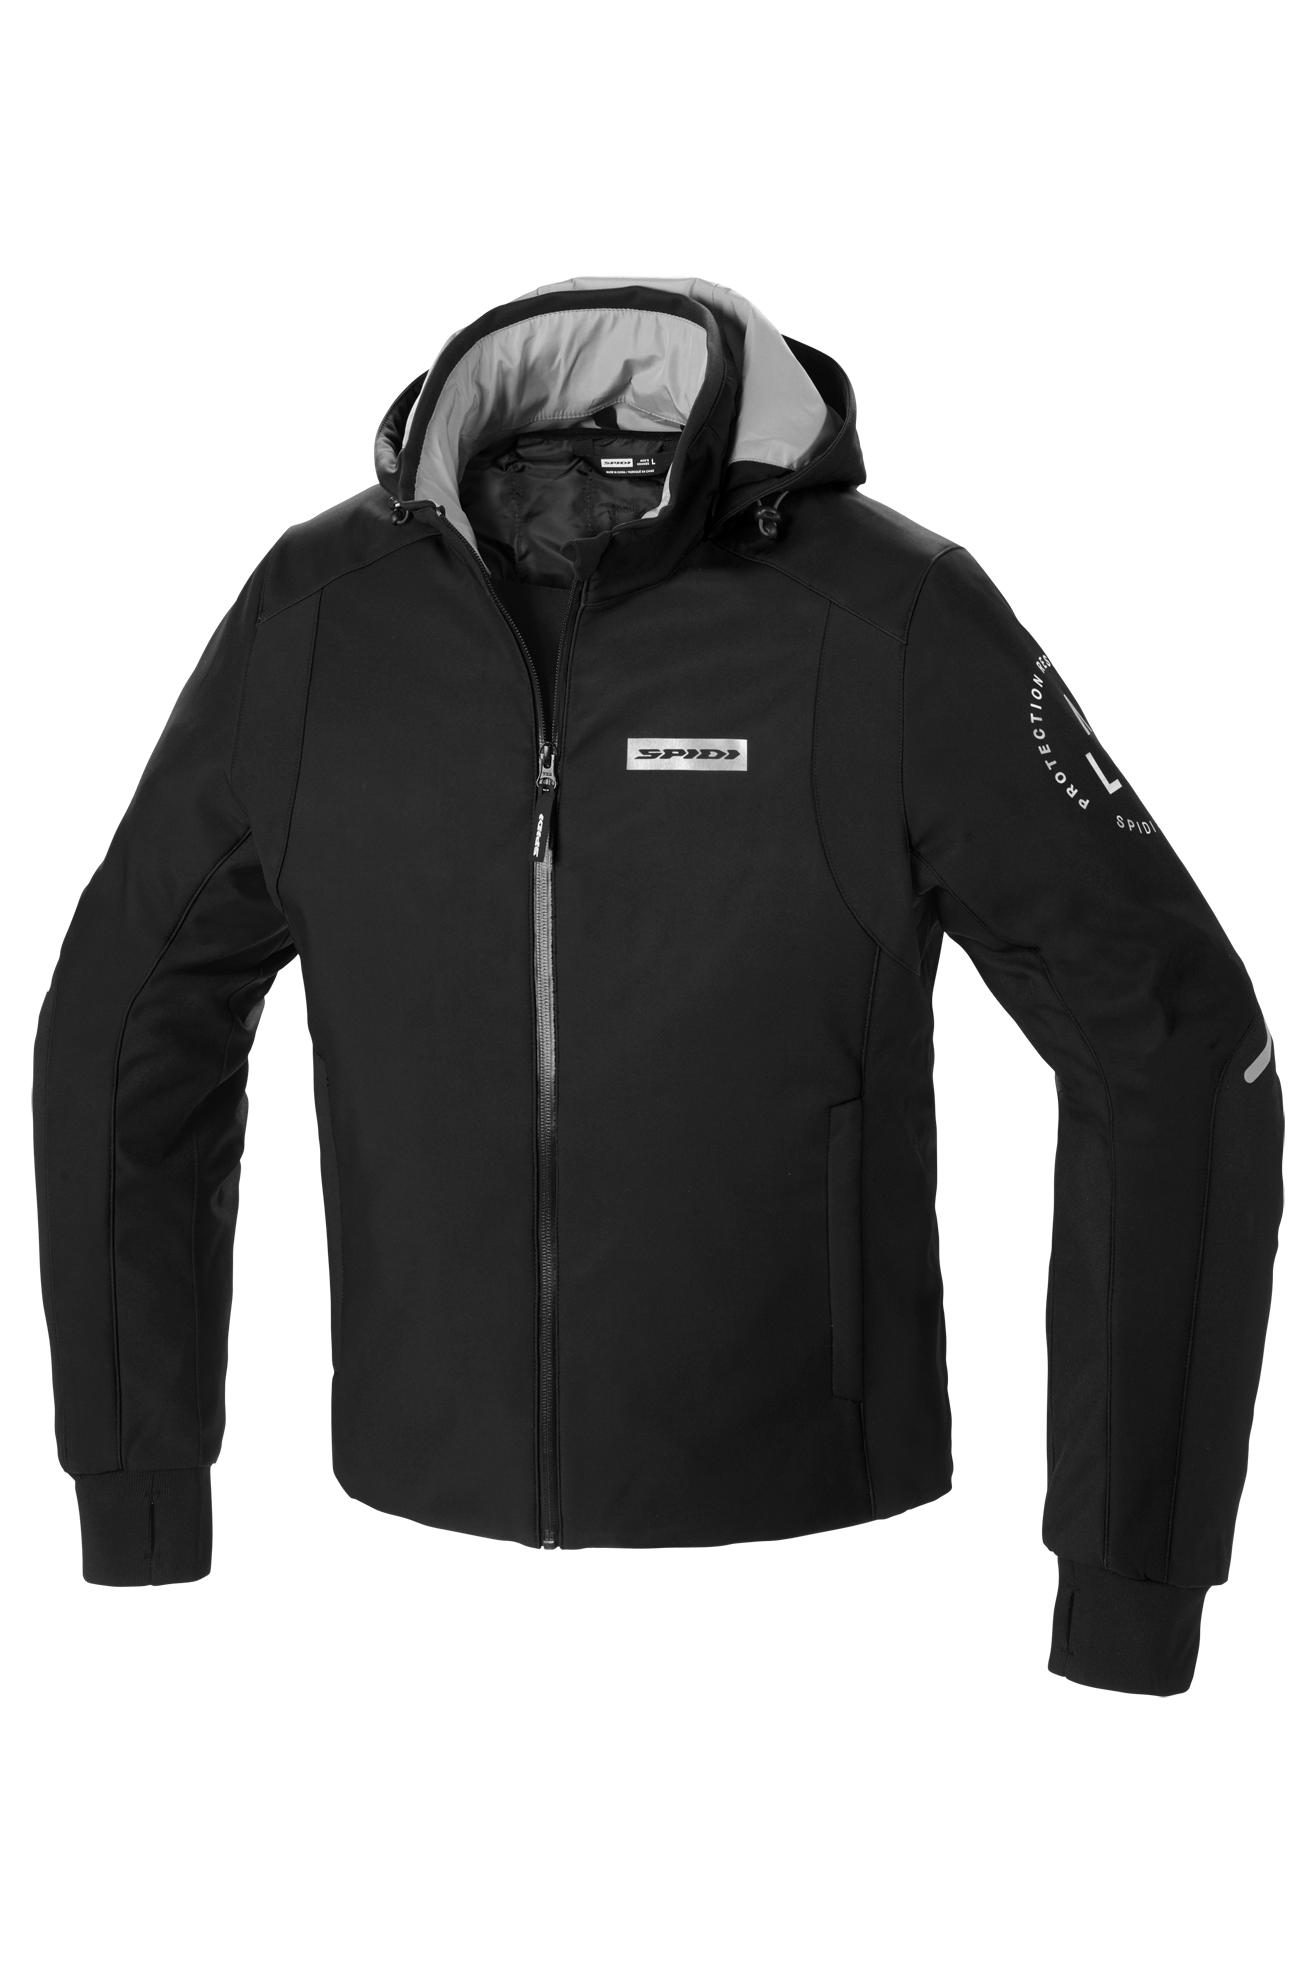 spidi giacca moto  hoodie armour h2out® nero-bianco